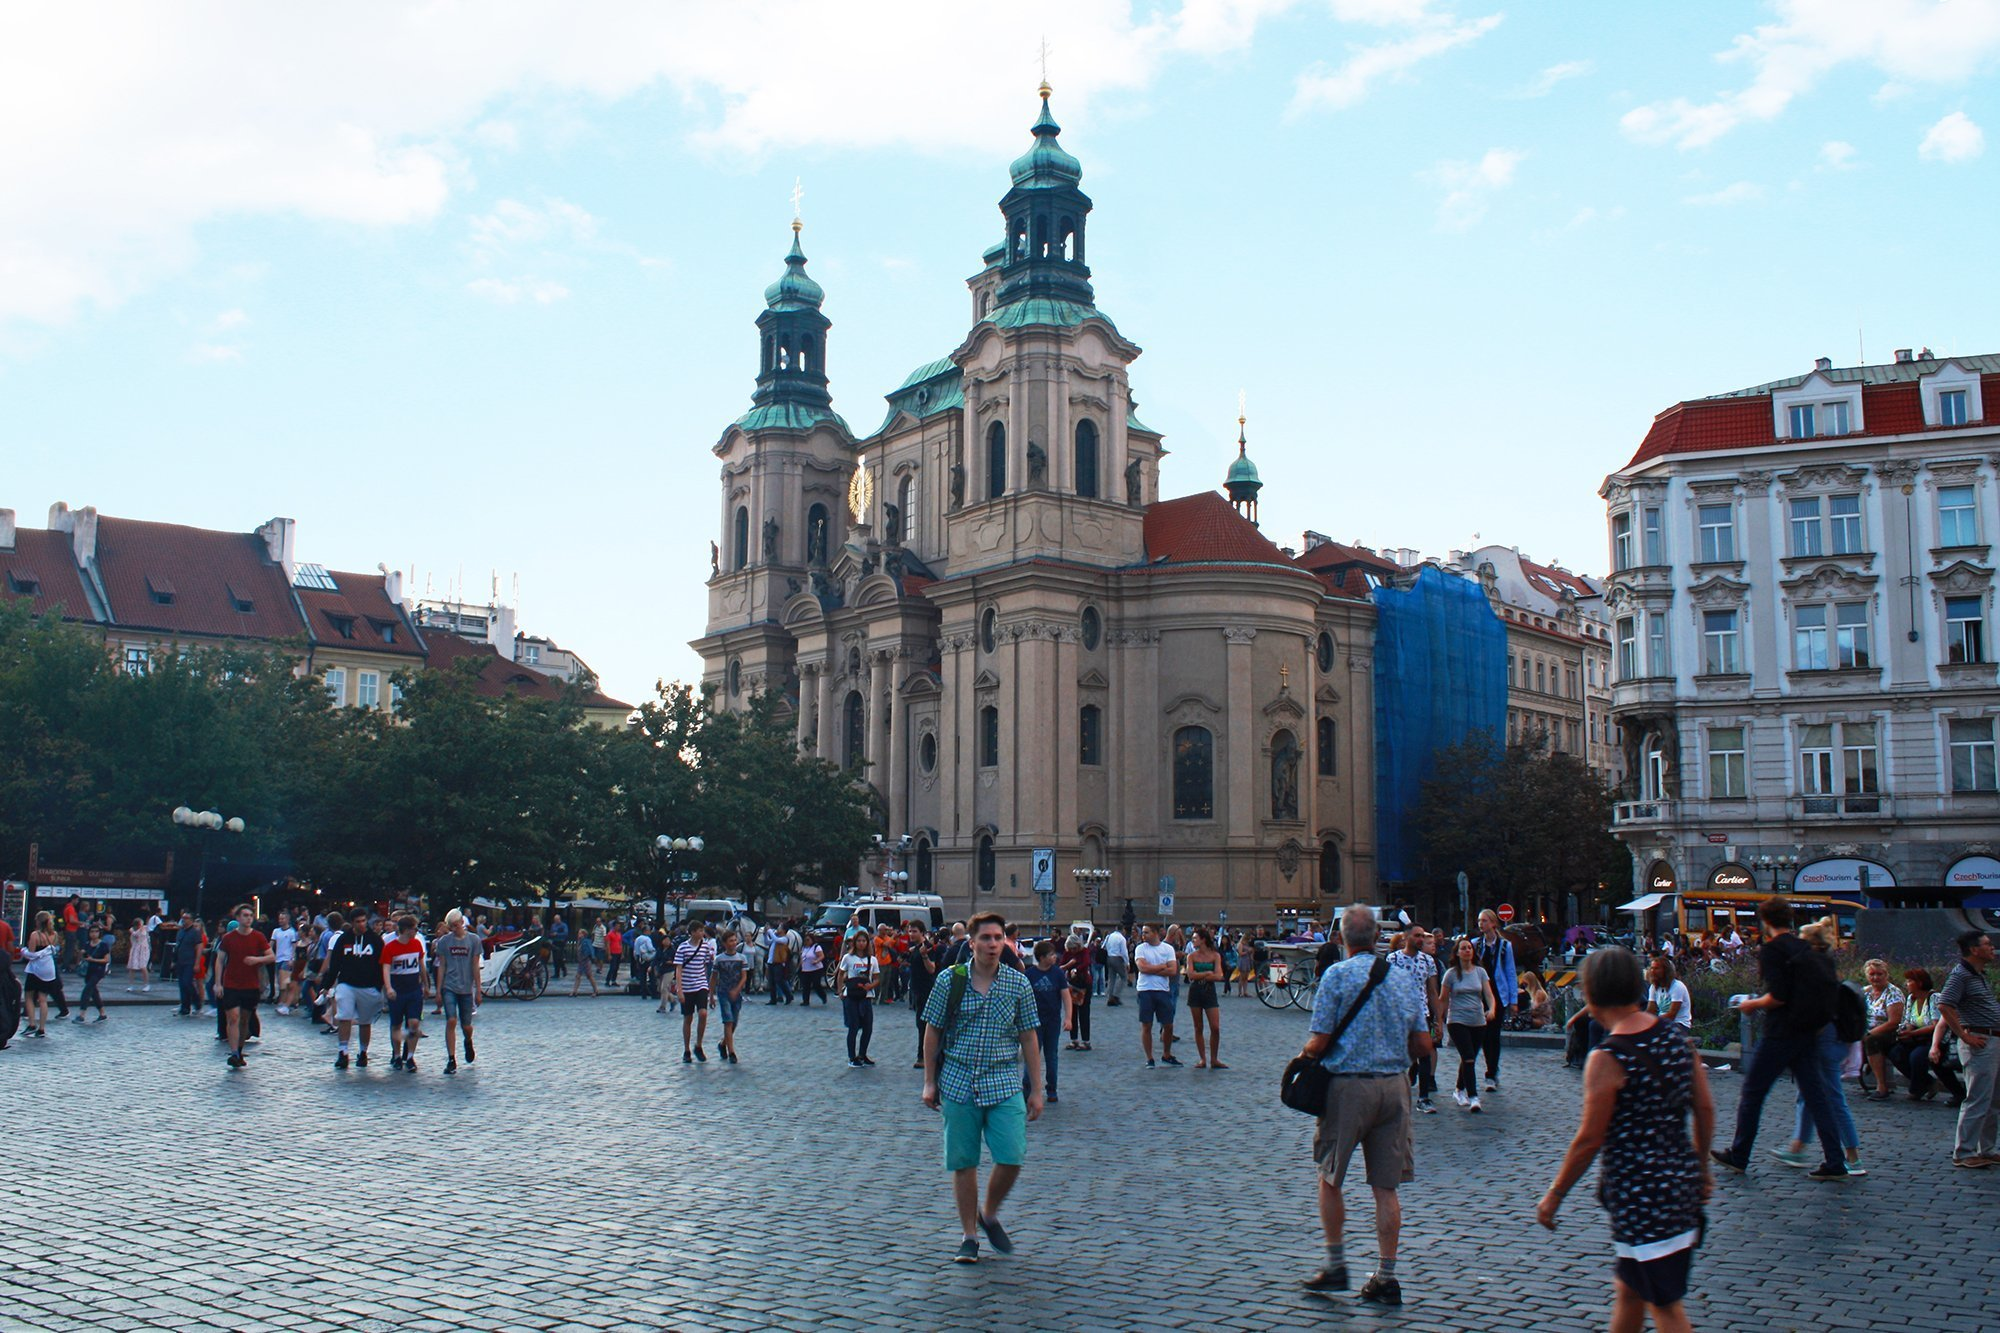 St Nicholas church, Old town square, Prague